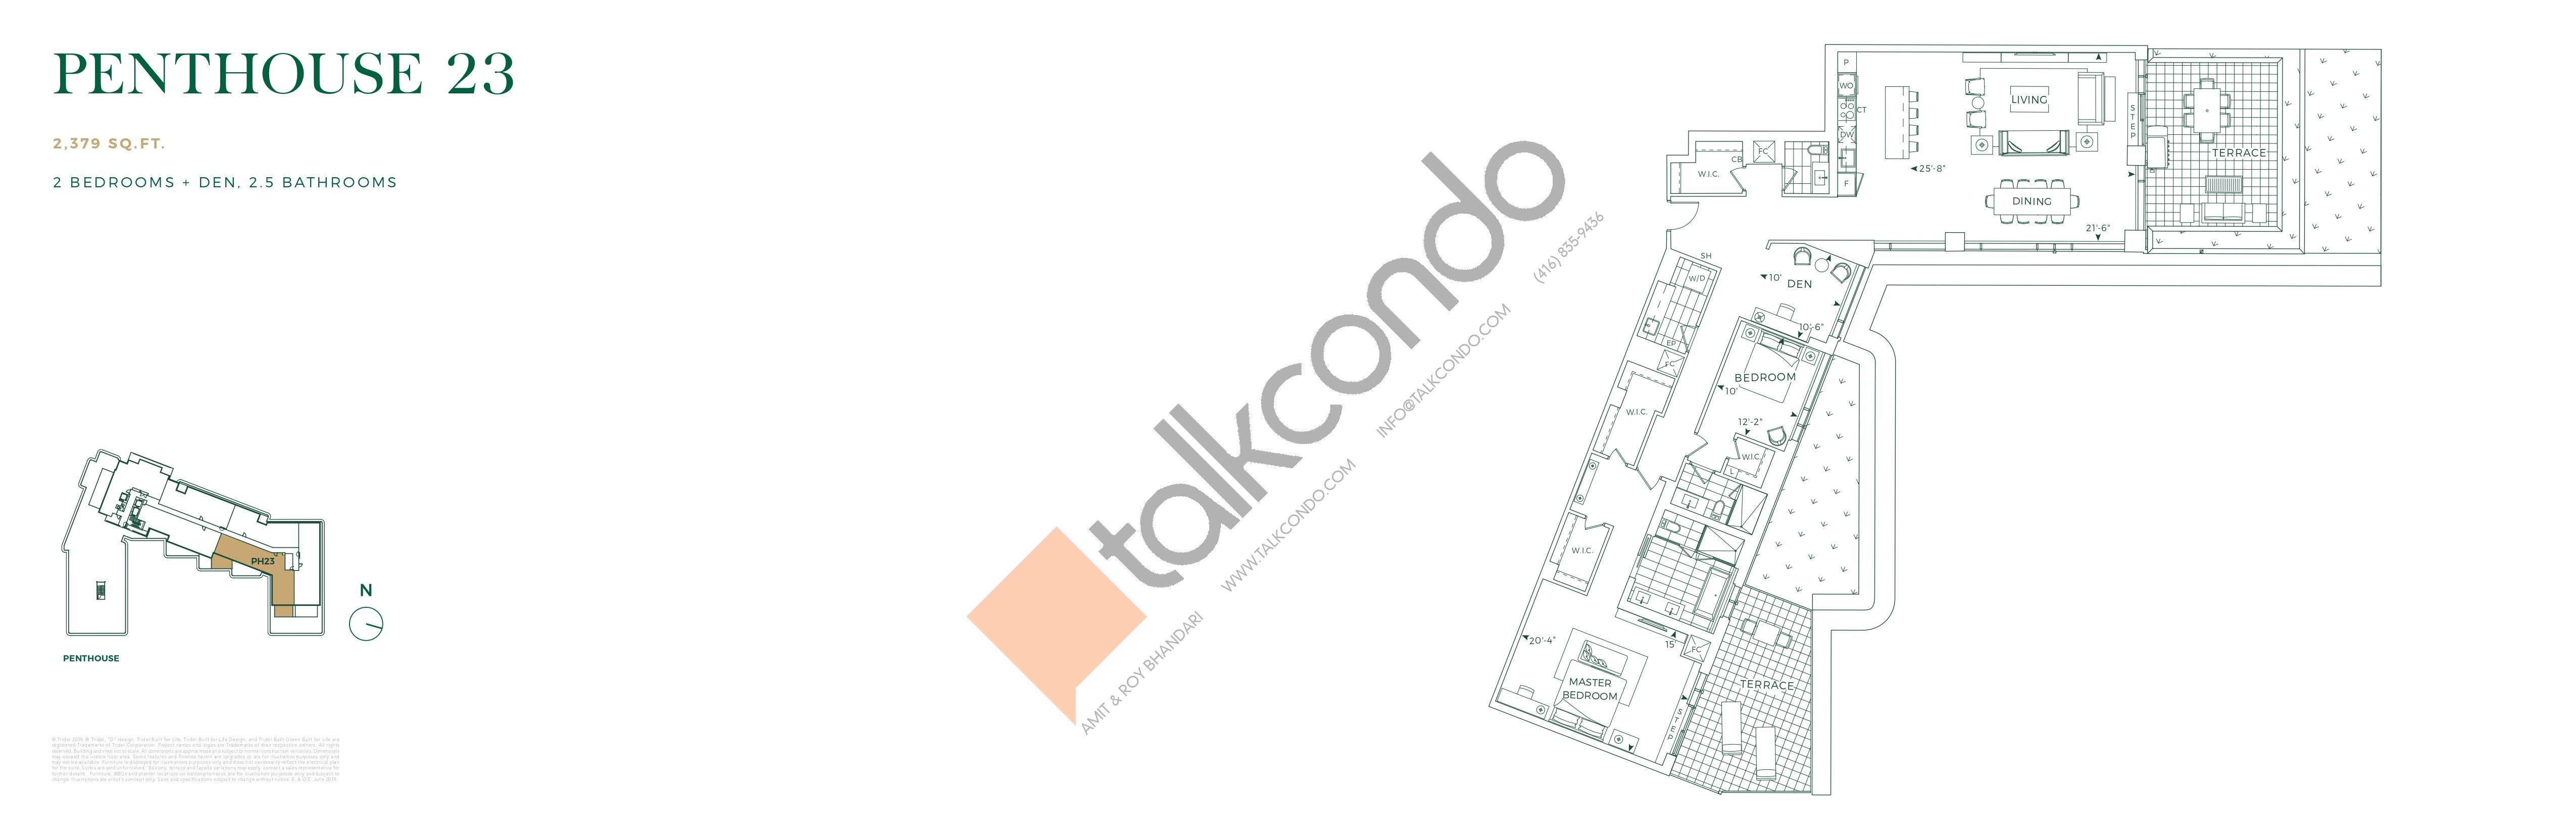 Penthouse 23 Floor Plan at Edenbridge on the Kingsway Condos - 2379 sq.ft